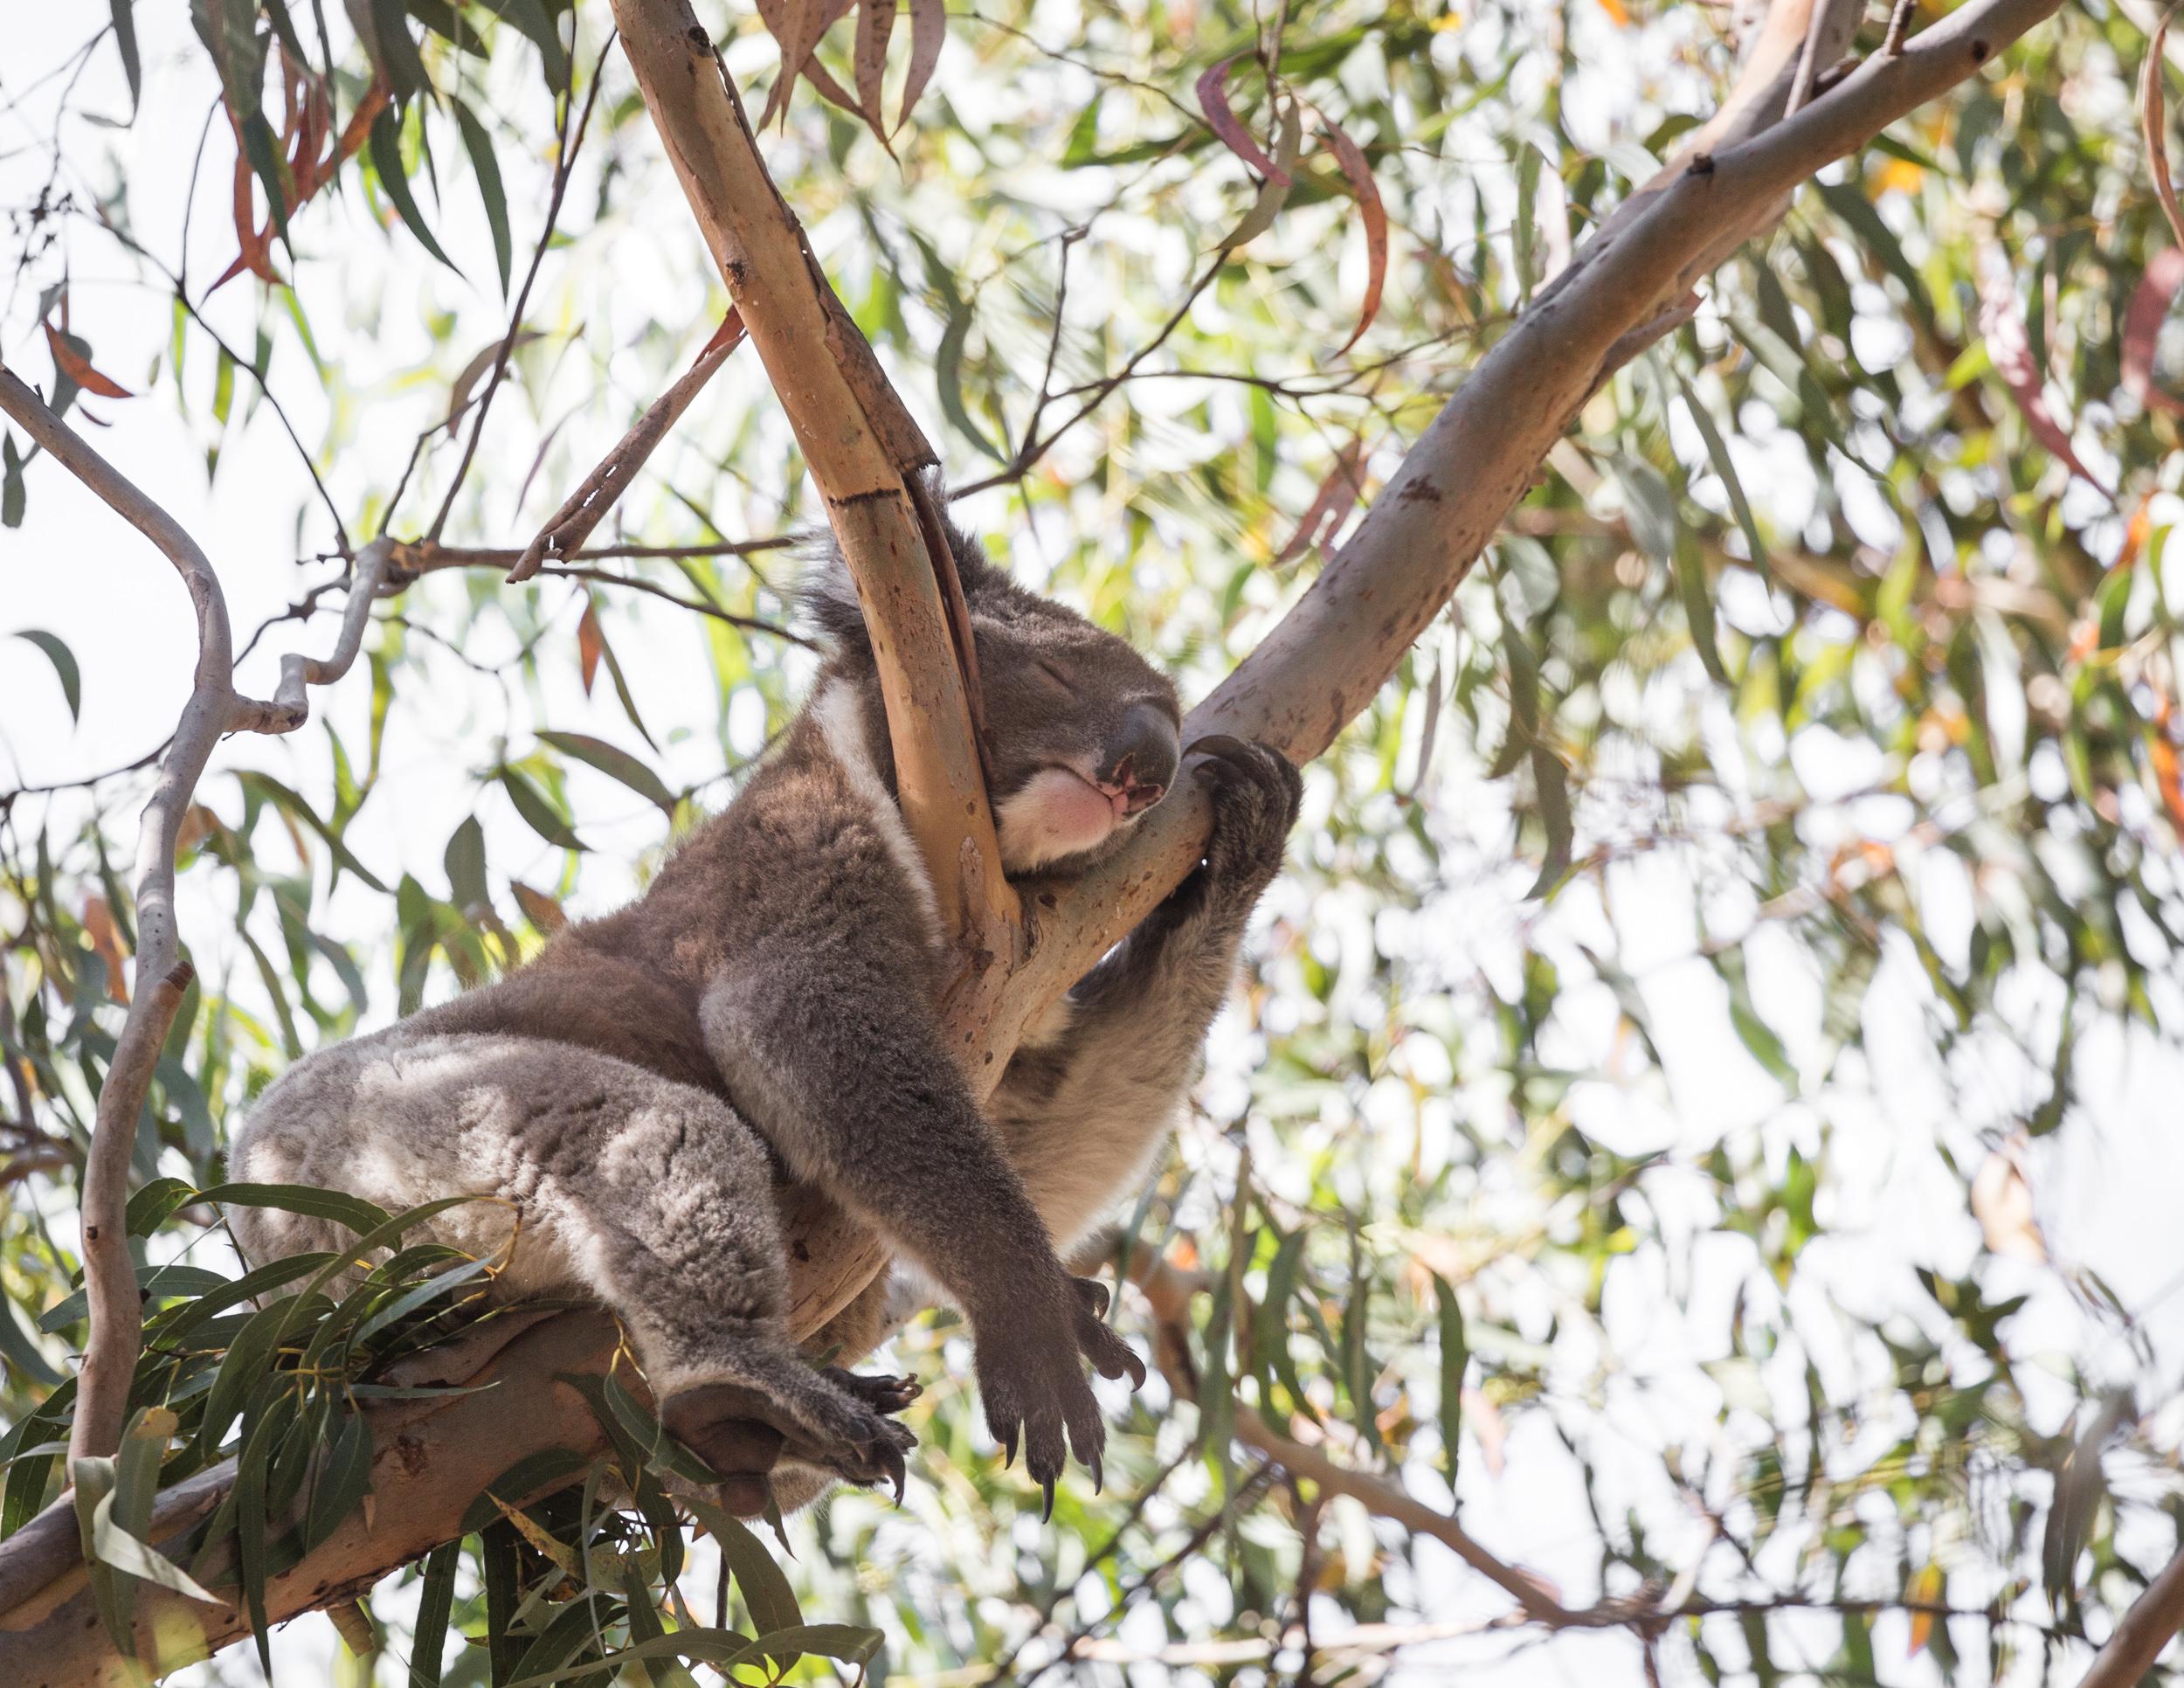 Koala at Flinders Chase National Park: Where to see wild koalas in Australia